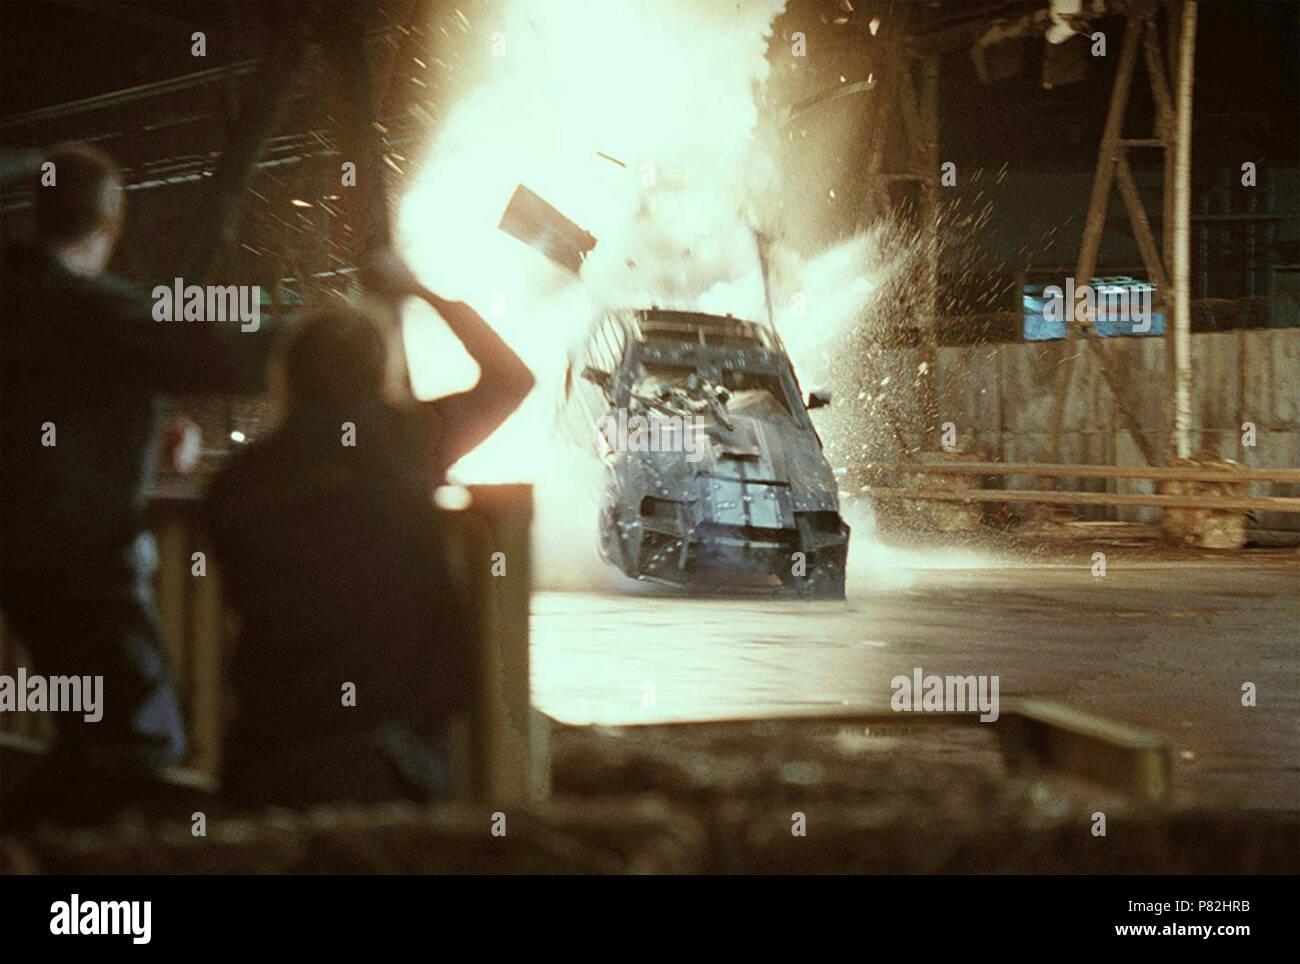 DEATH RACE 2008 Universal Pictures Film Stockbild